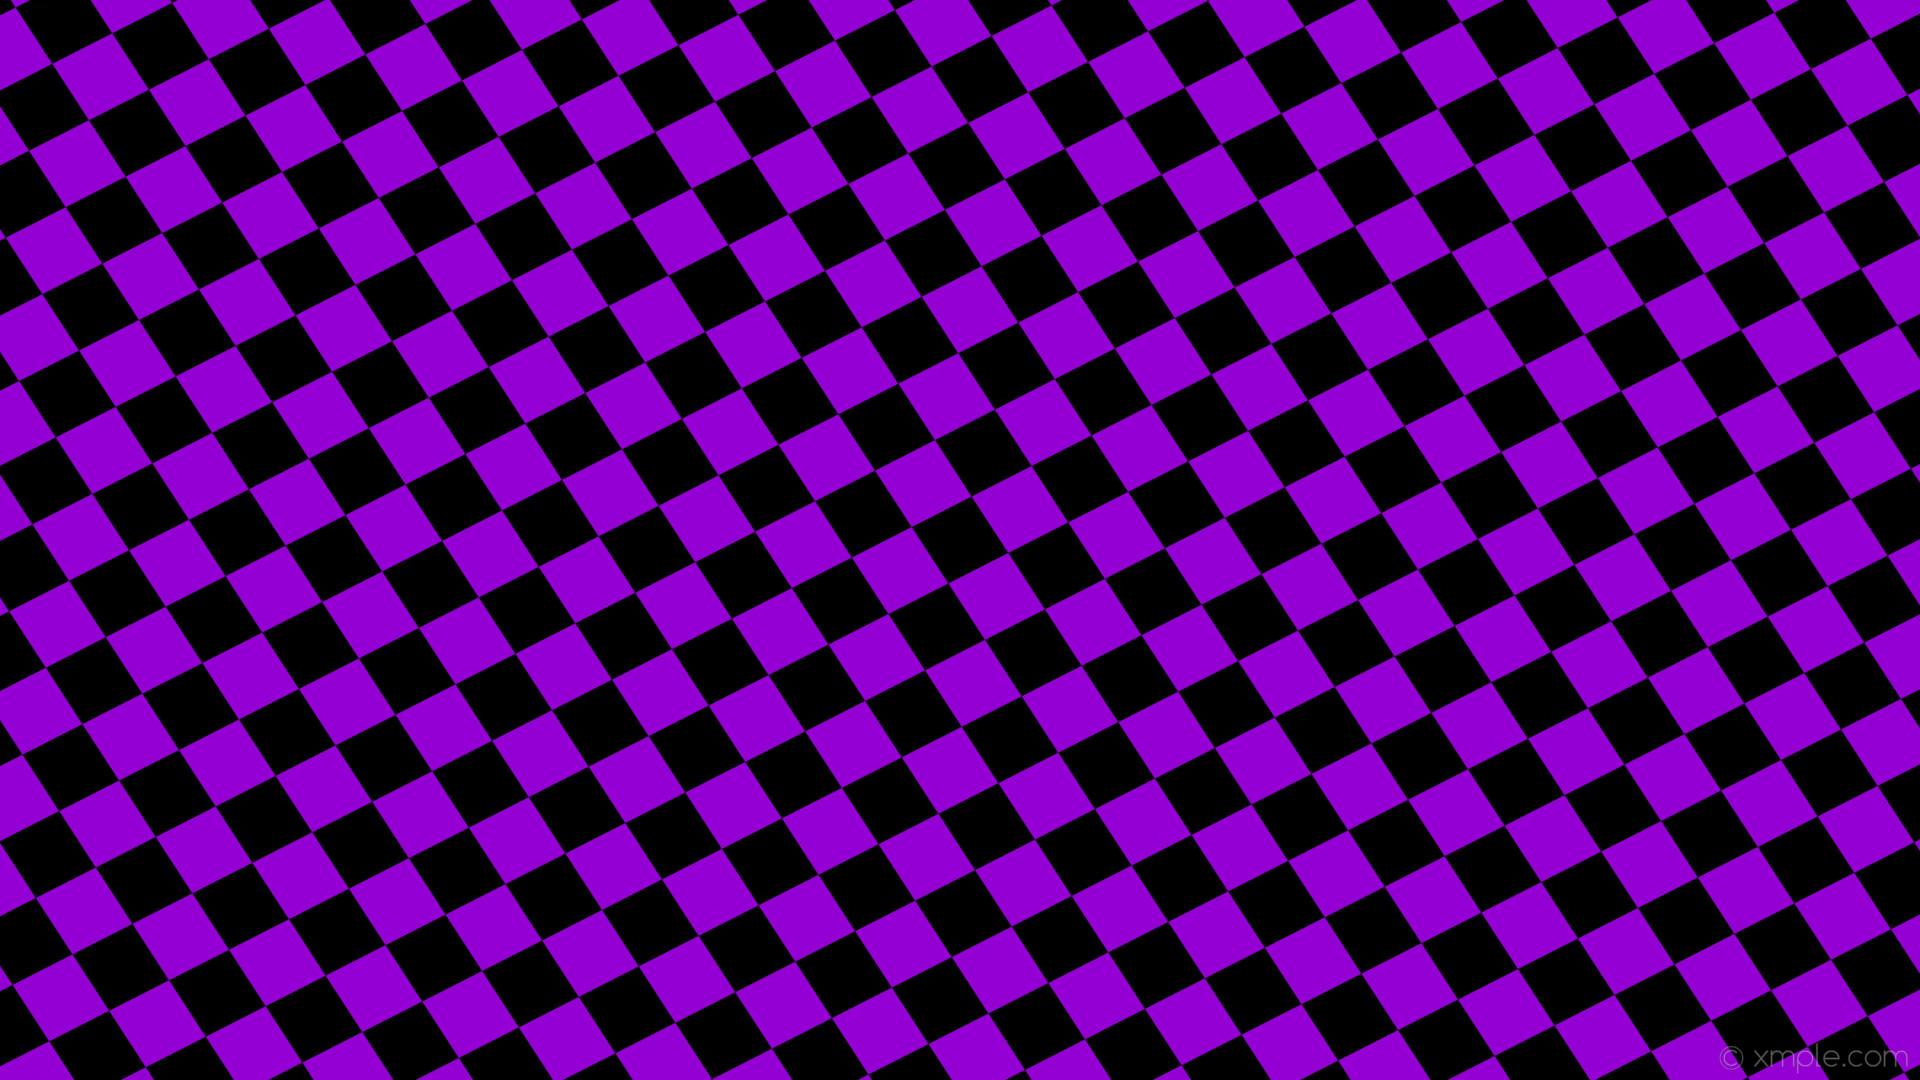 wallpaper lozenge black purple diamond rhombus dark violet #000000 #9400d3  165° 100px 90px